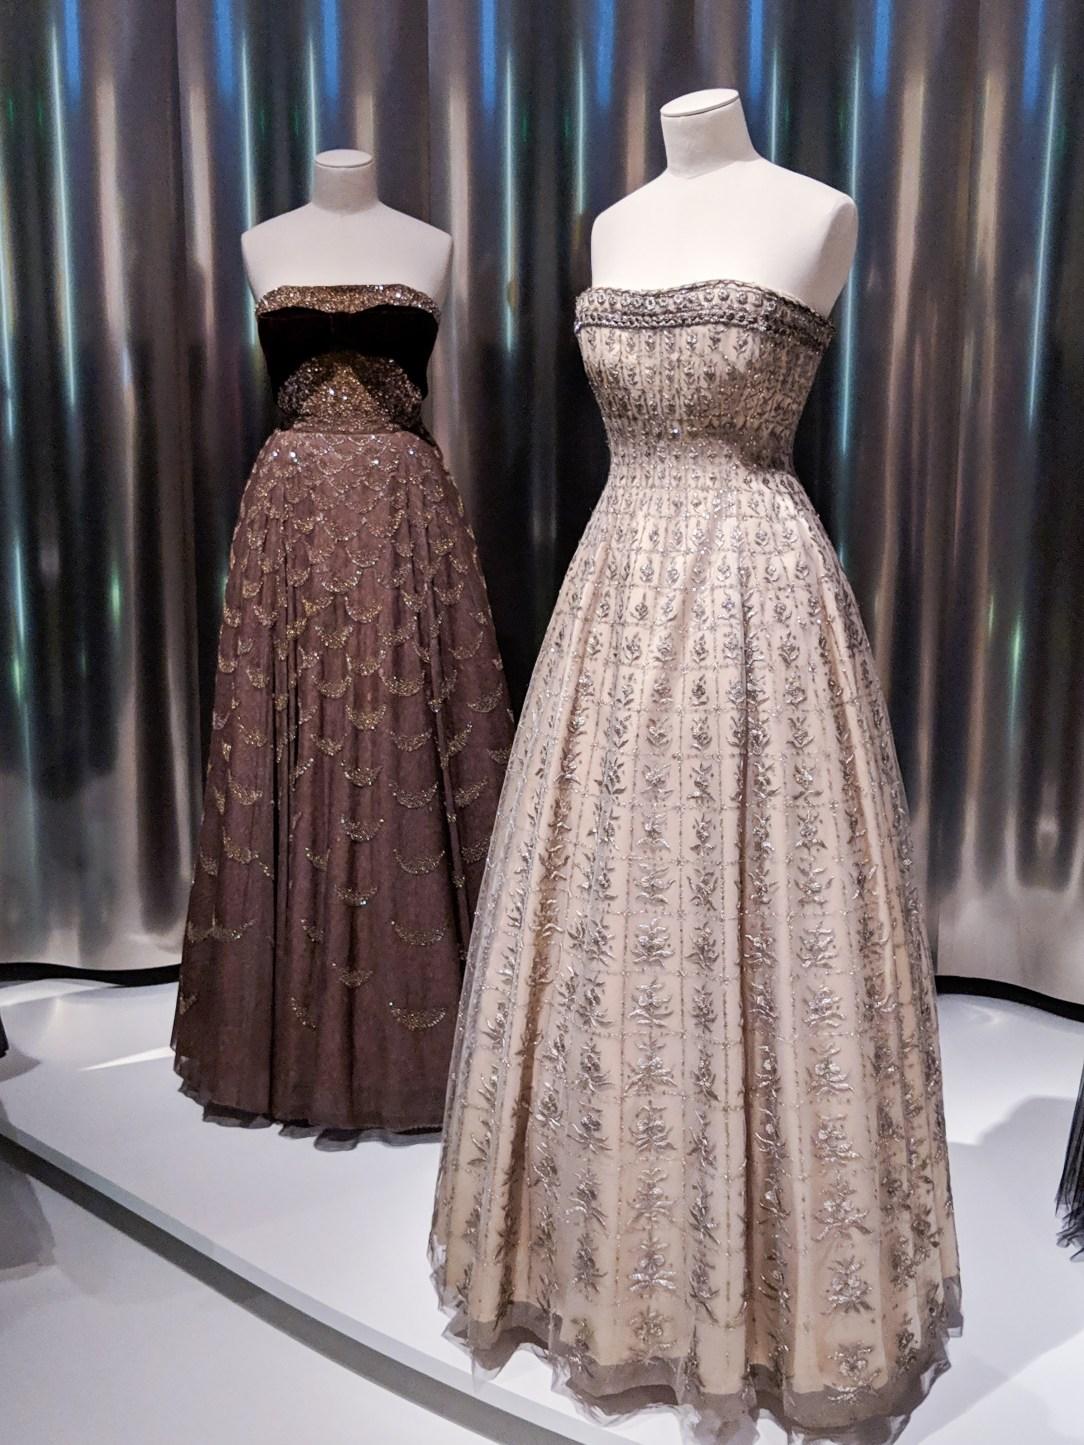 Dior gowns, Dior fashion, haute couture